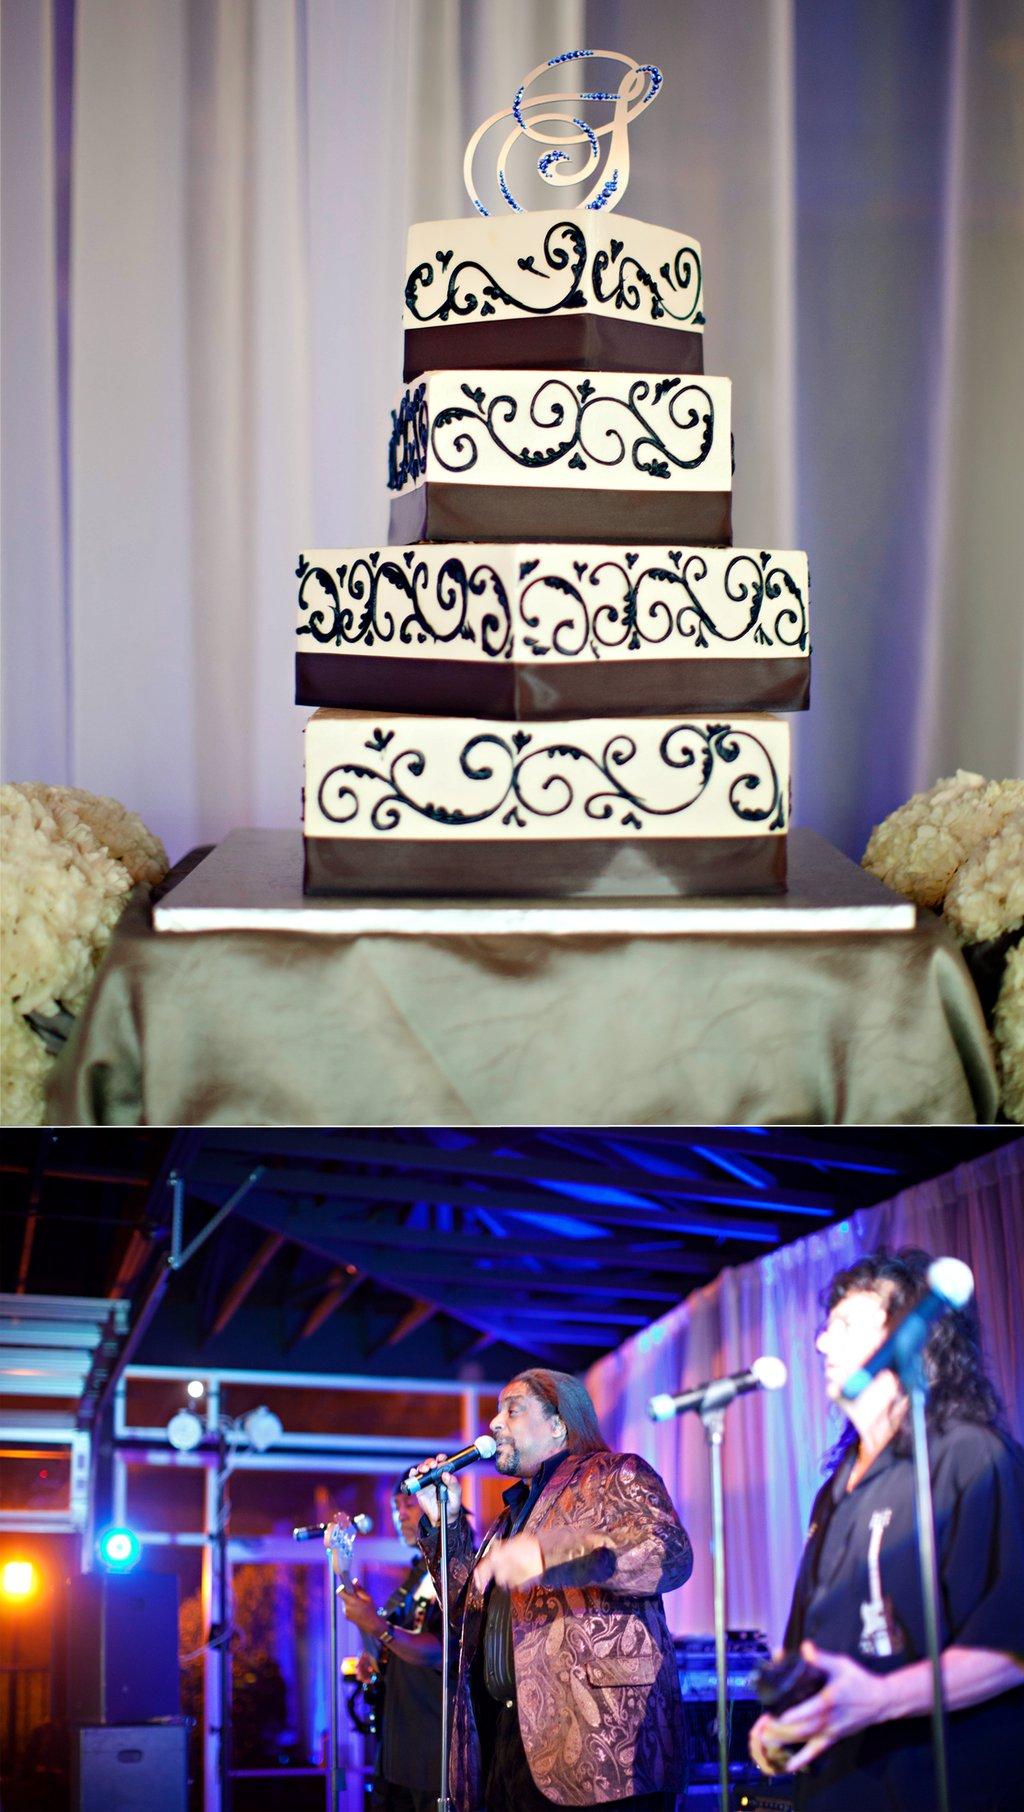 Real-weddings-classic-wedding-cake-reception-band-dj.full